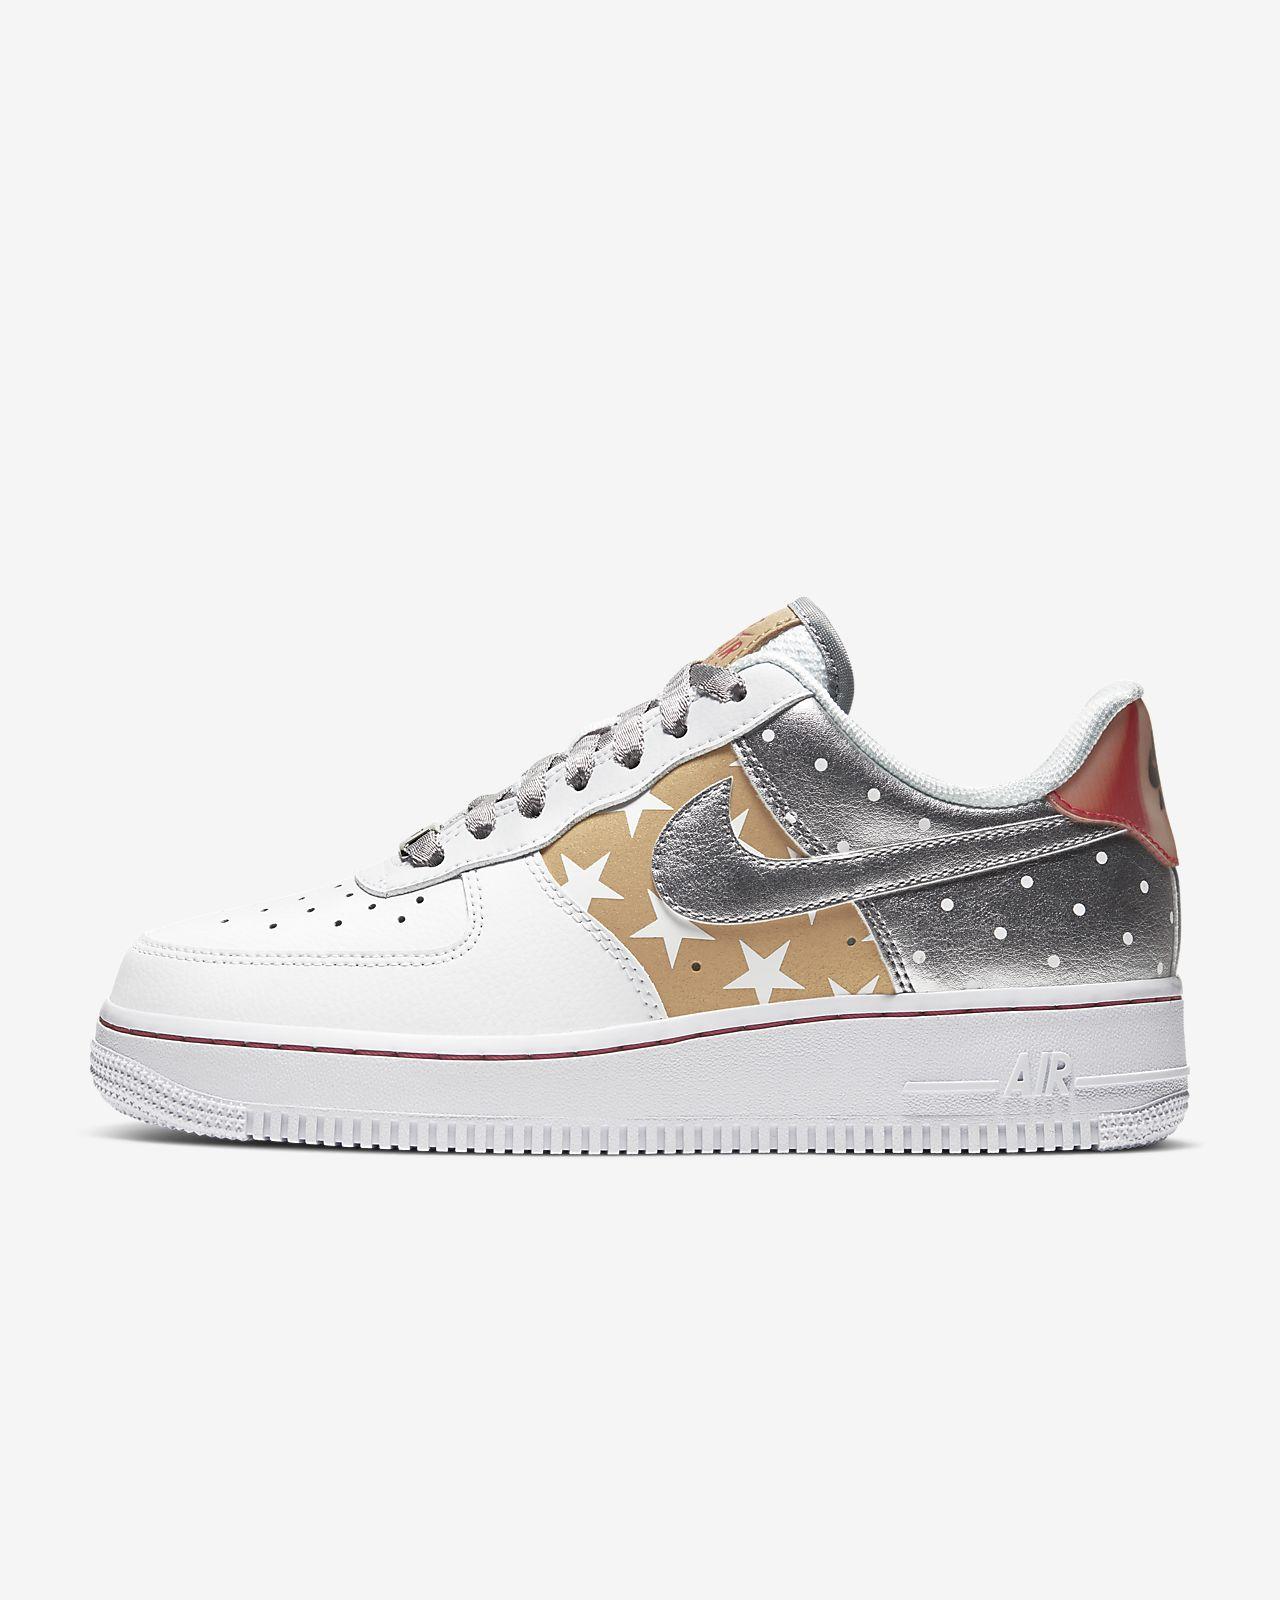 Chaussure Nike Air Force 1 '07